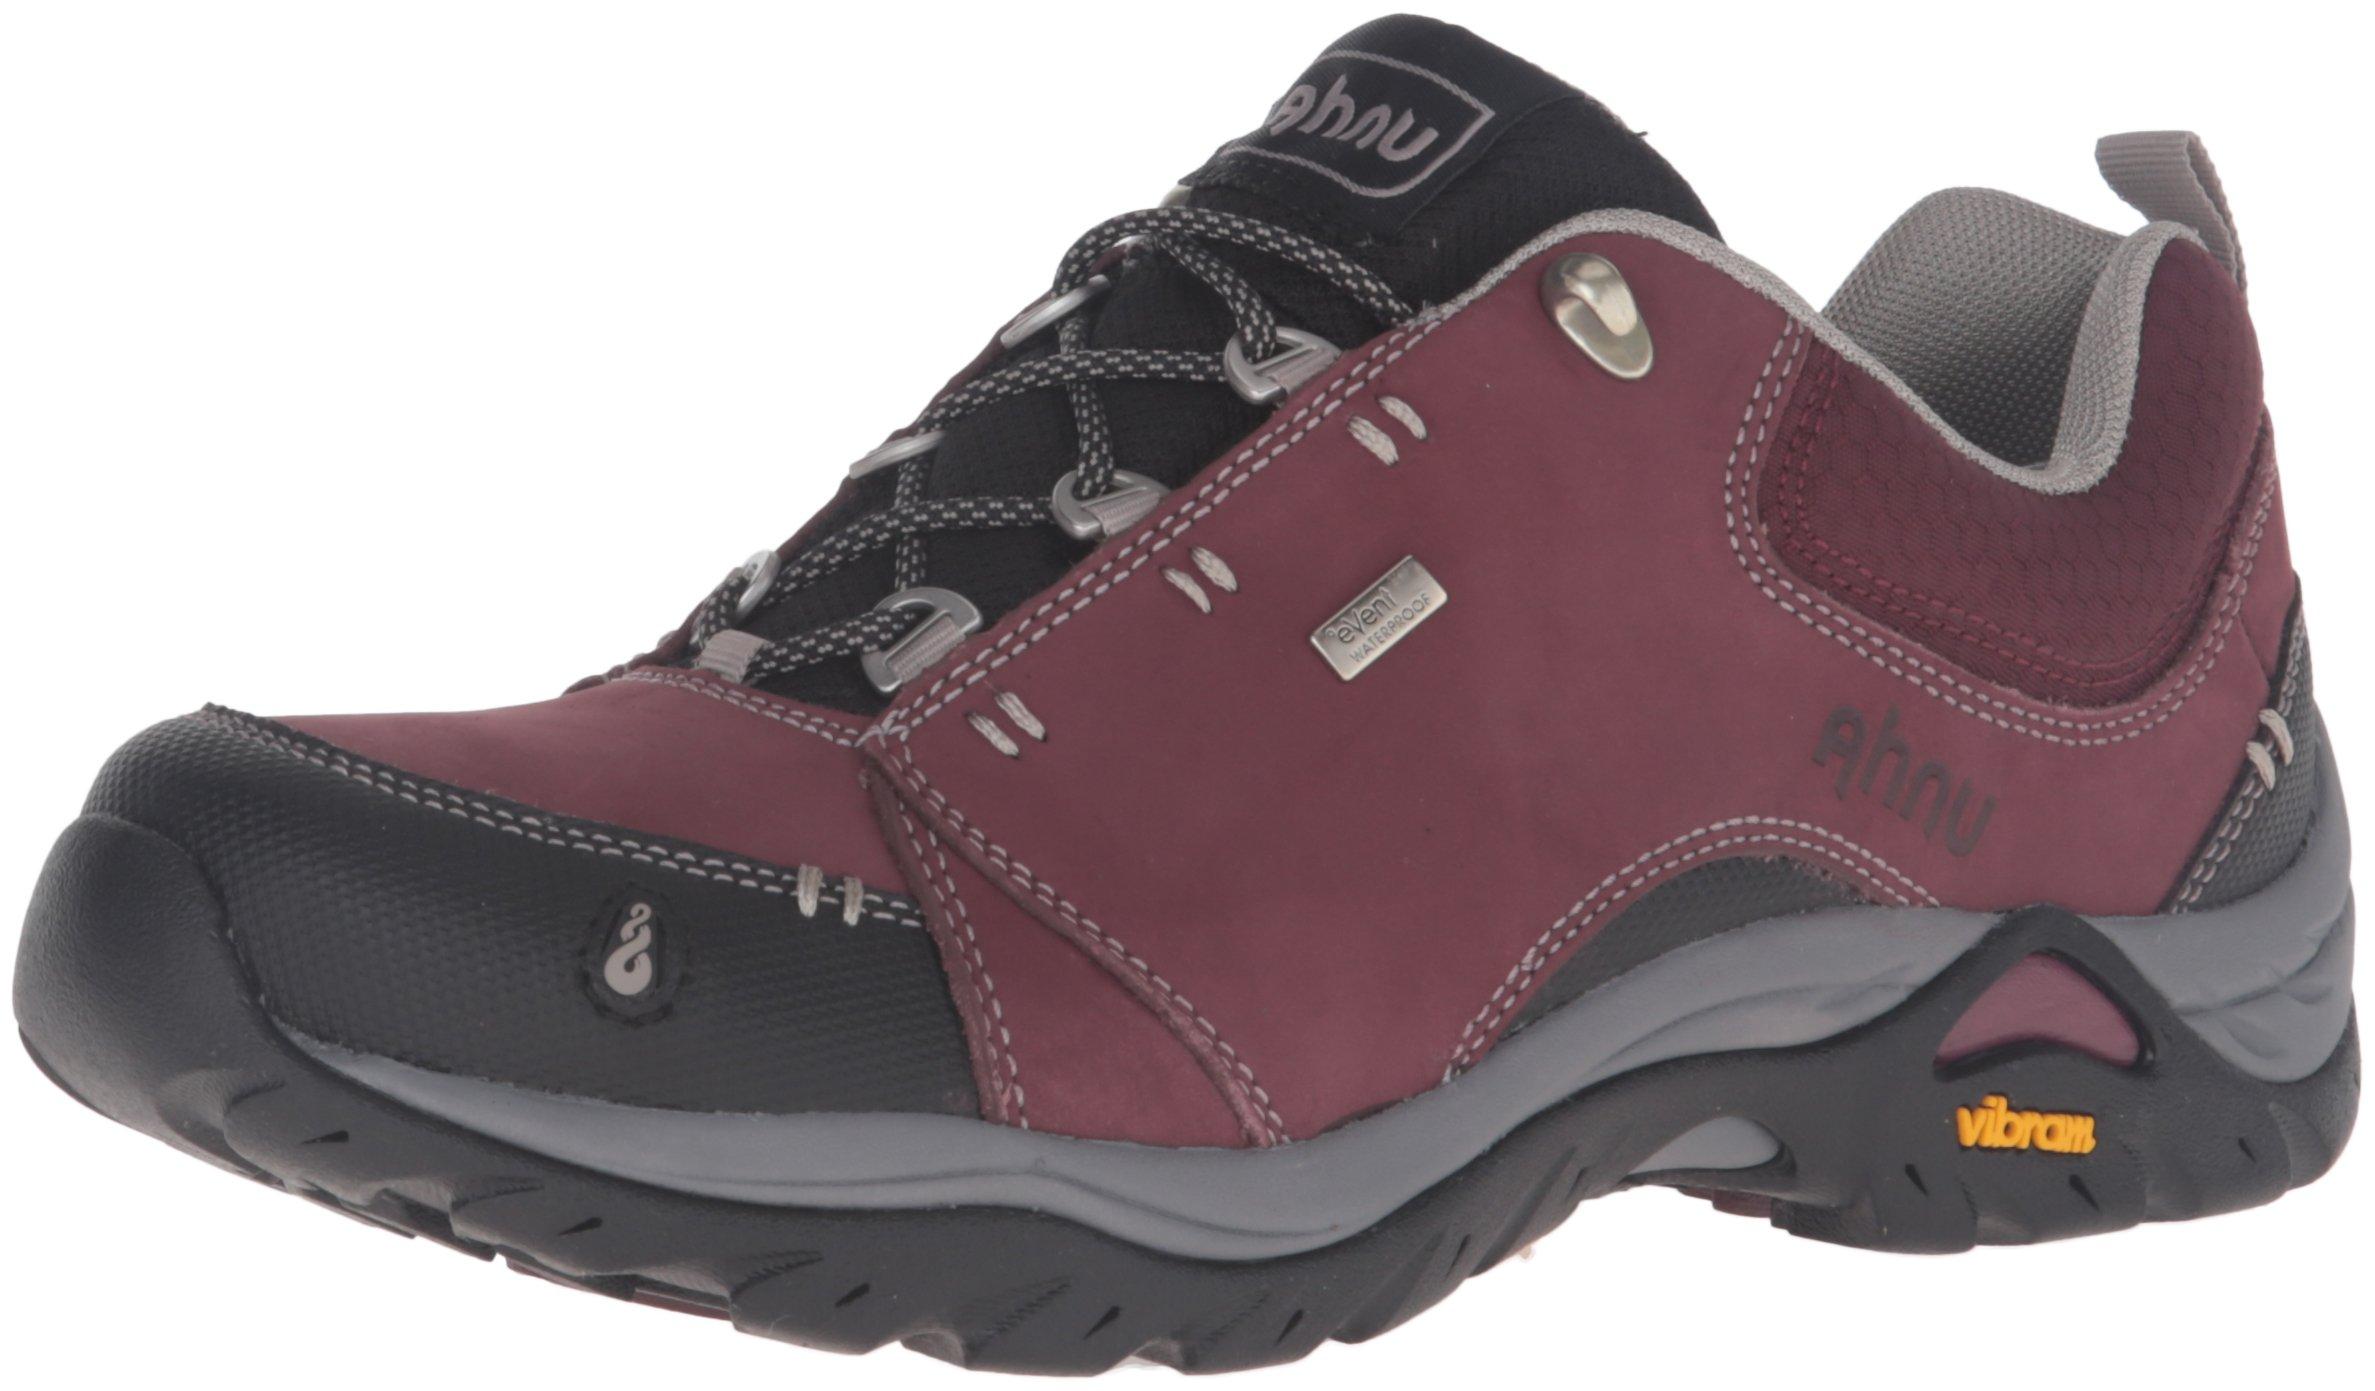 Ahnu Women's Montara II Waterproof Hiking Shoe, Mission Fig, 8 M US